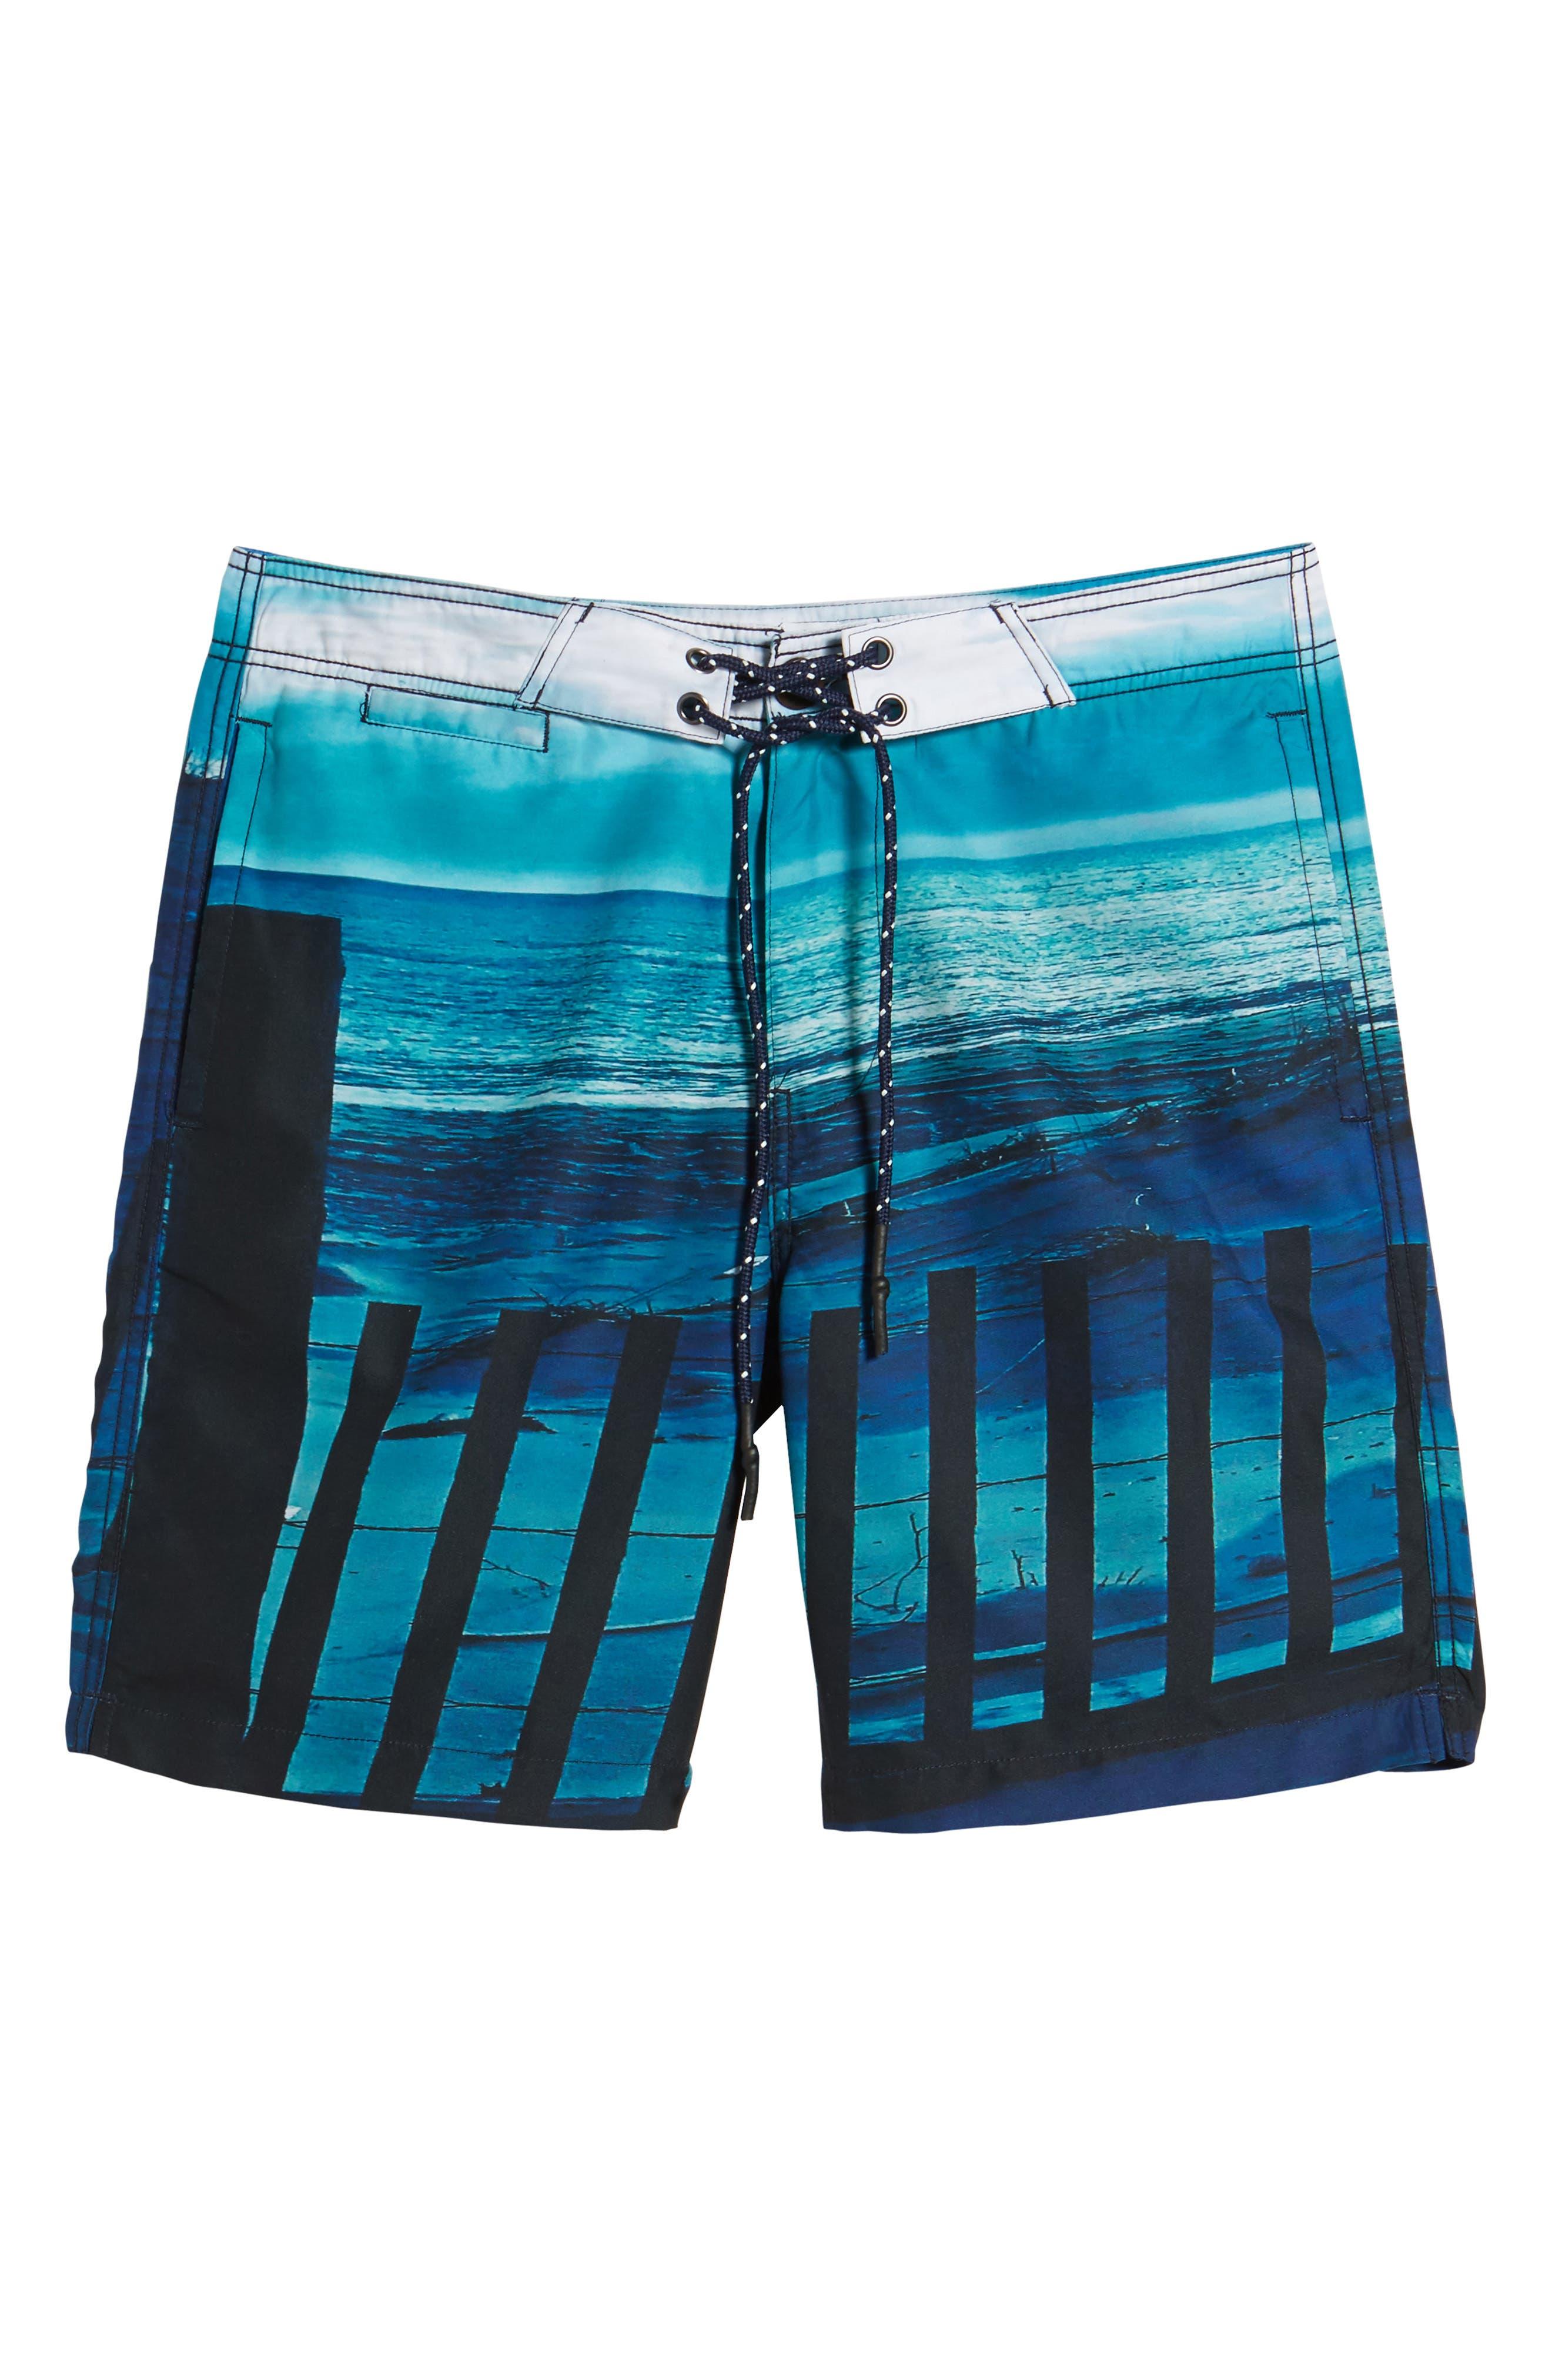 Beach Fence Photo Real Board Shorts,                             Alternate thumbnail 6, color,                             Beach